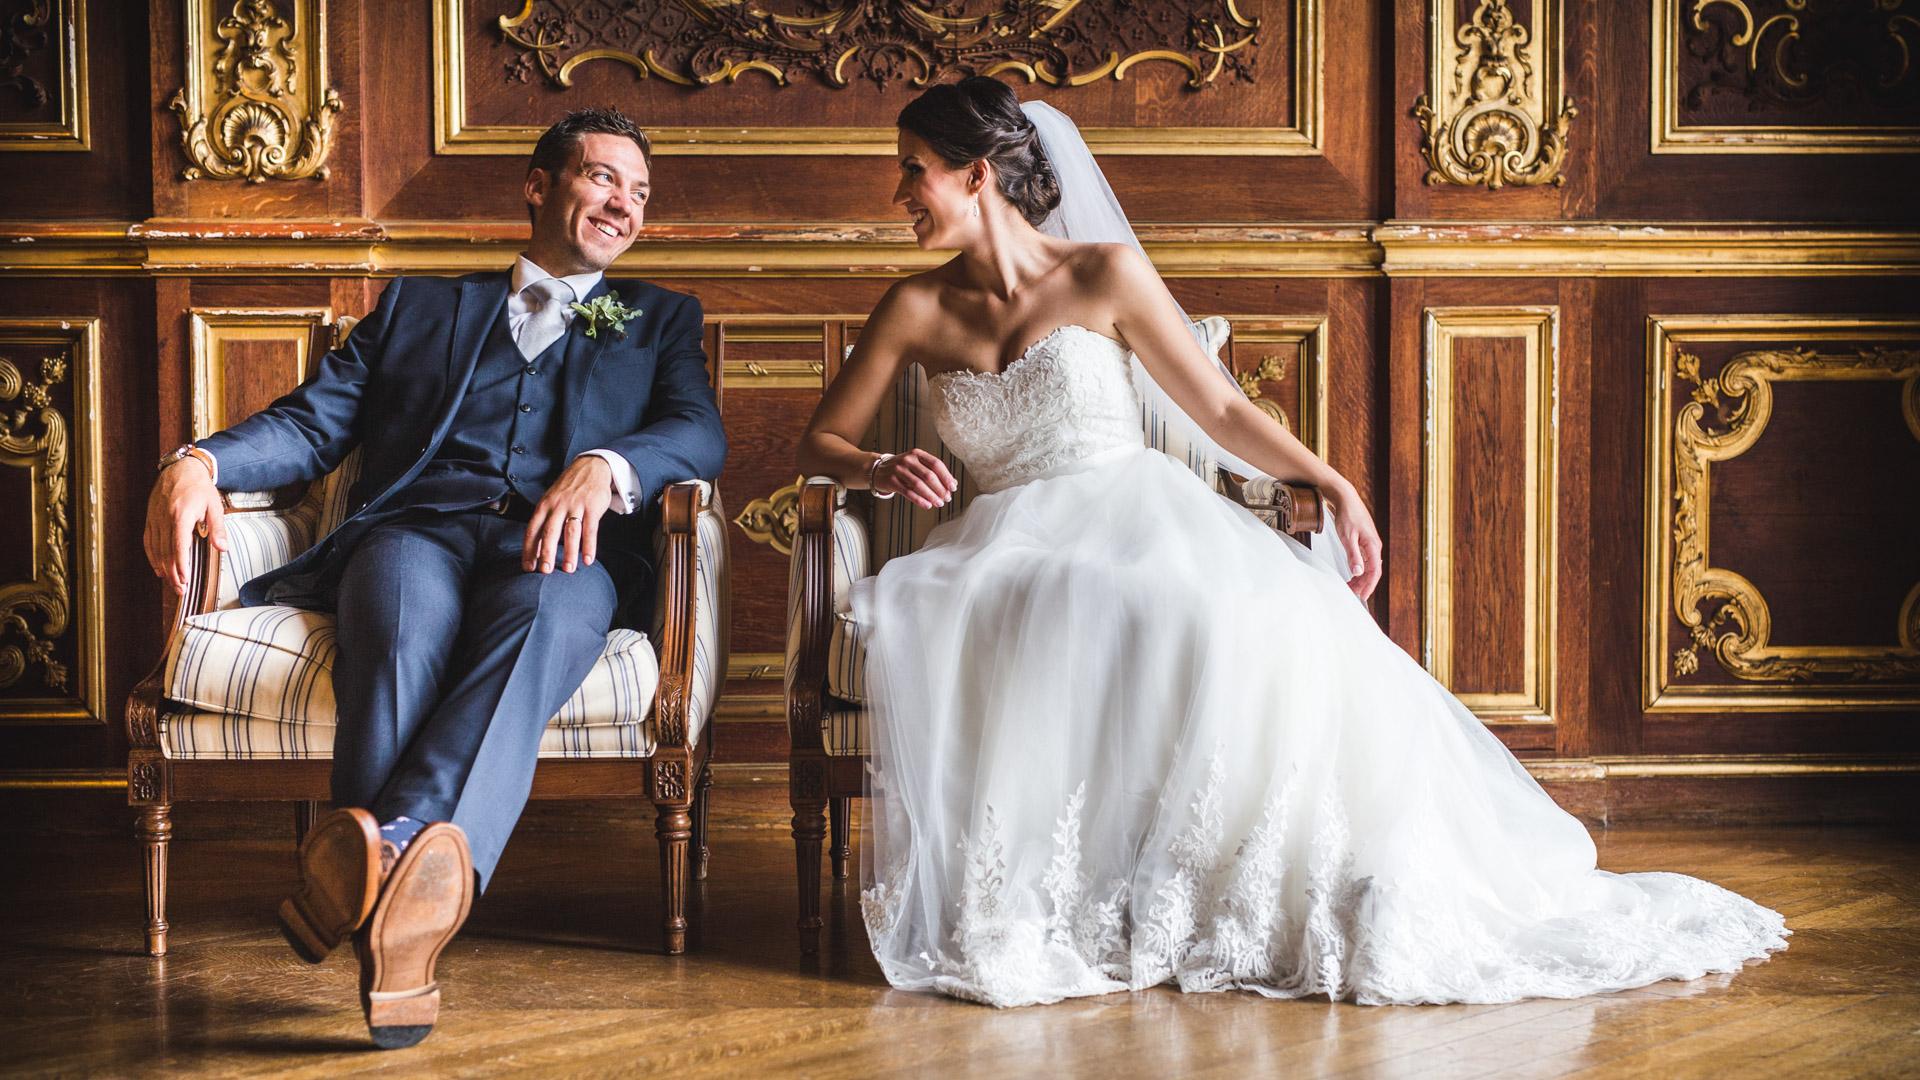 Wedding-Photography-in-Mansion-Ochre-Court-RI.jpg